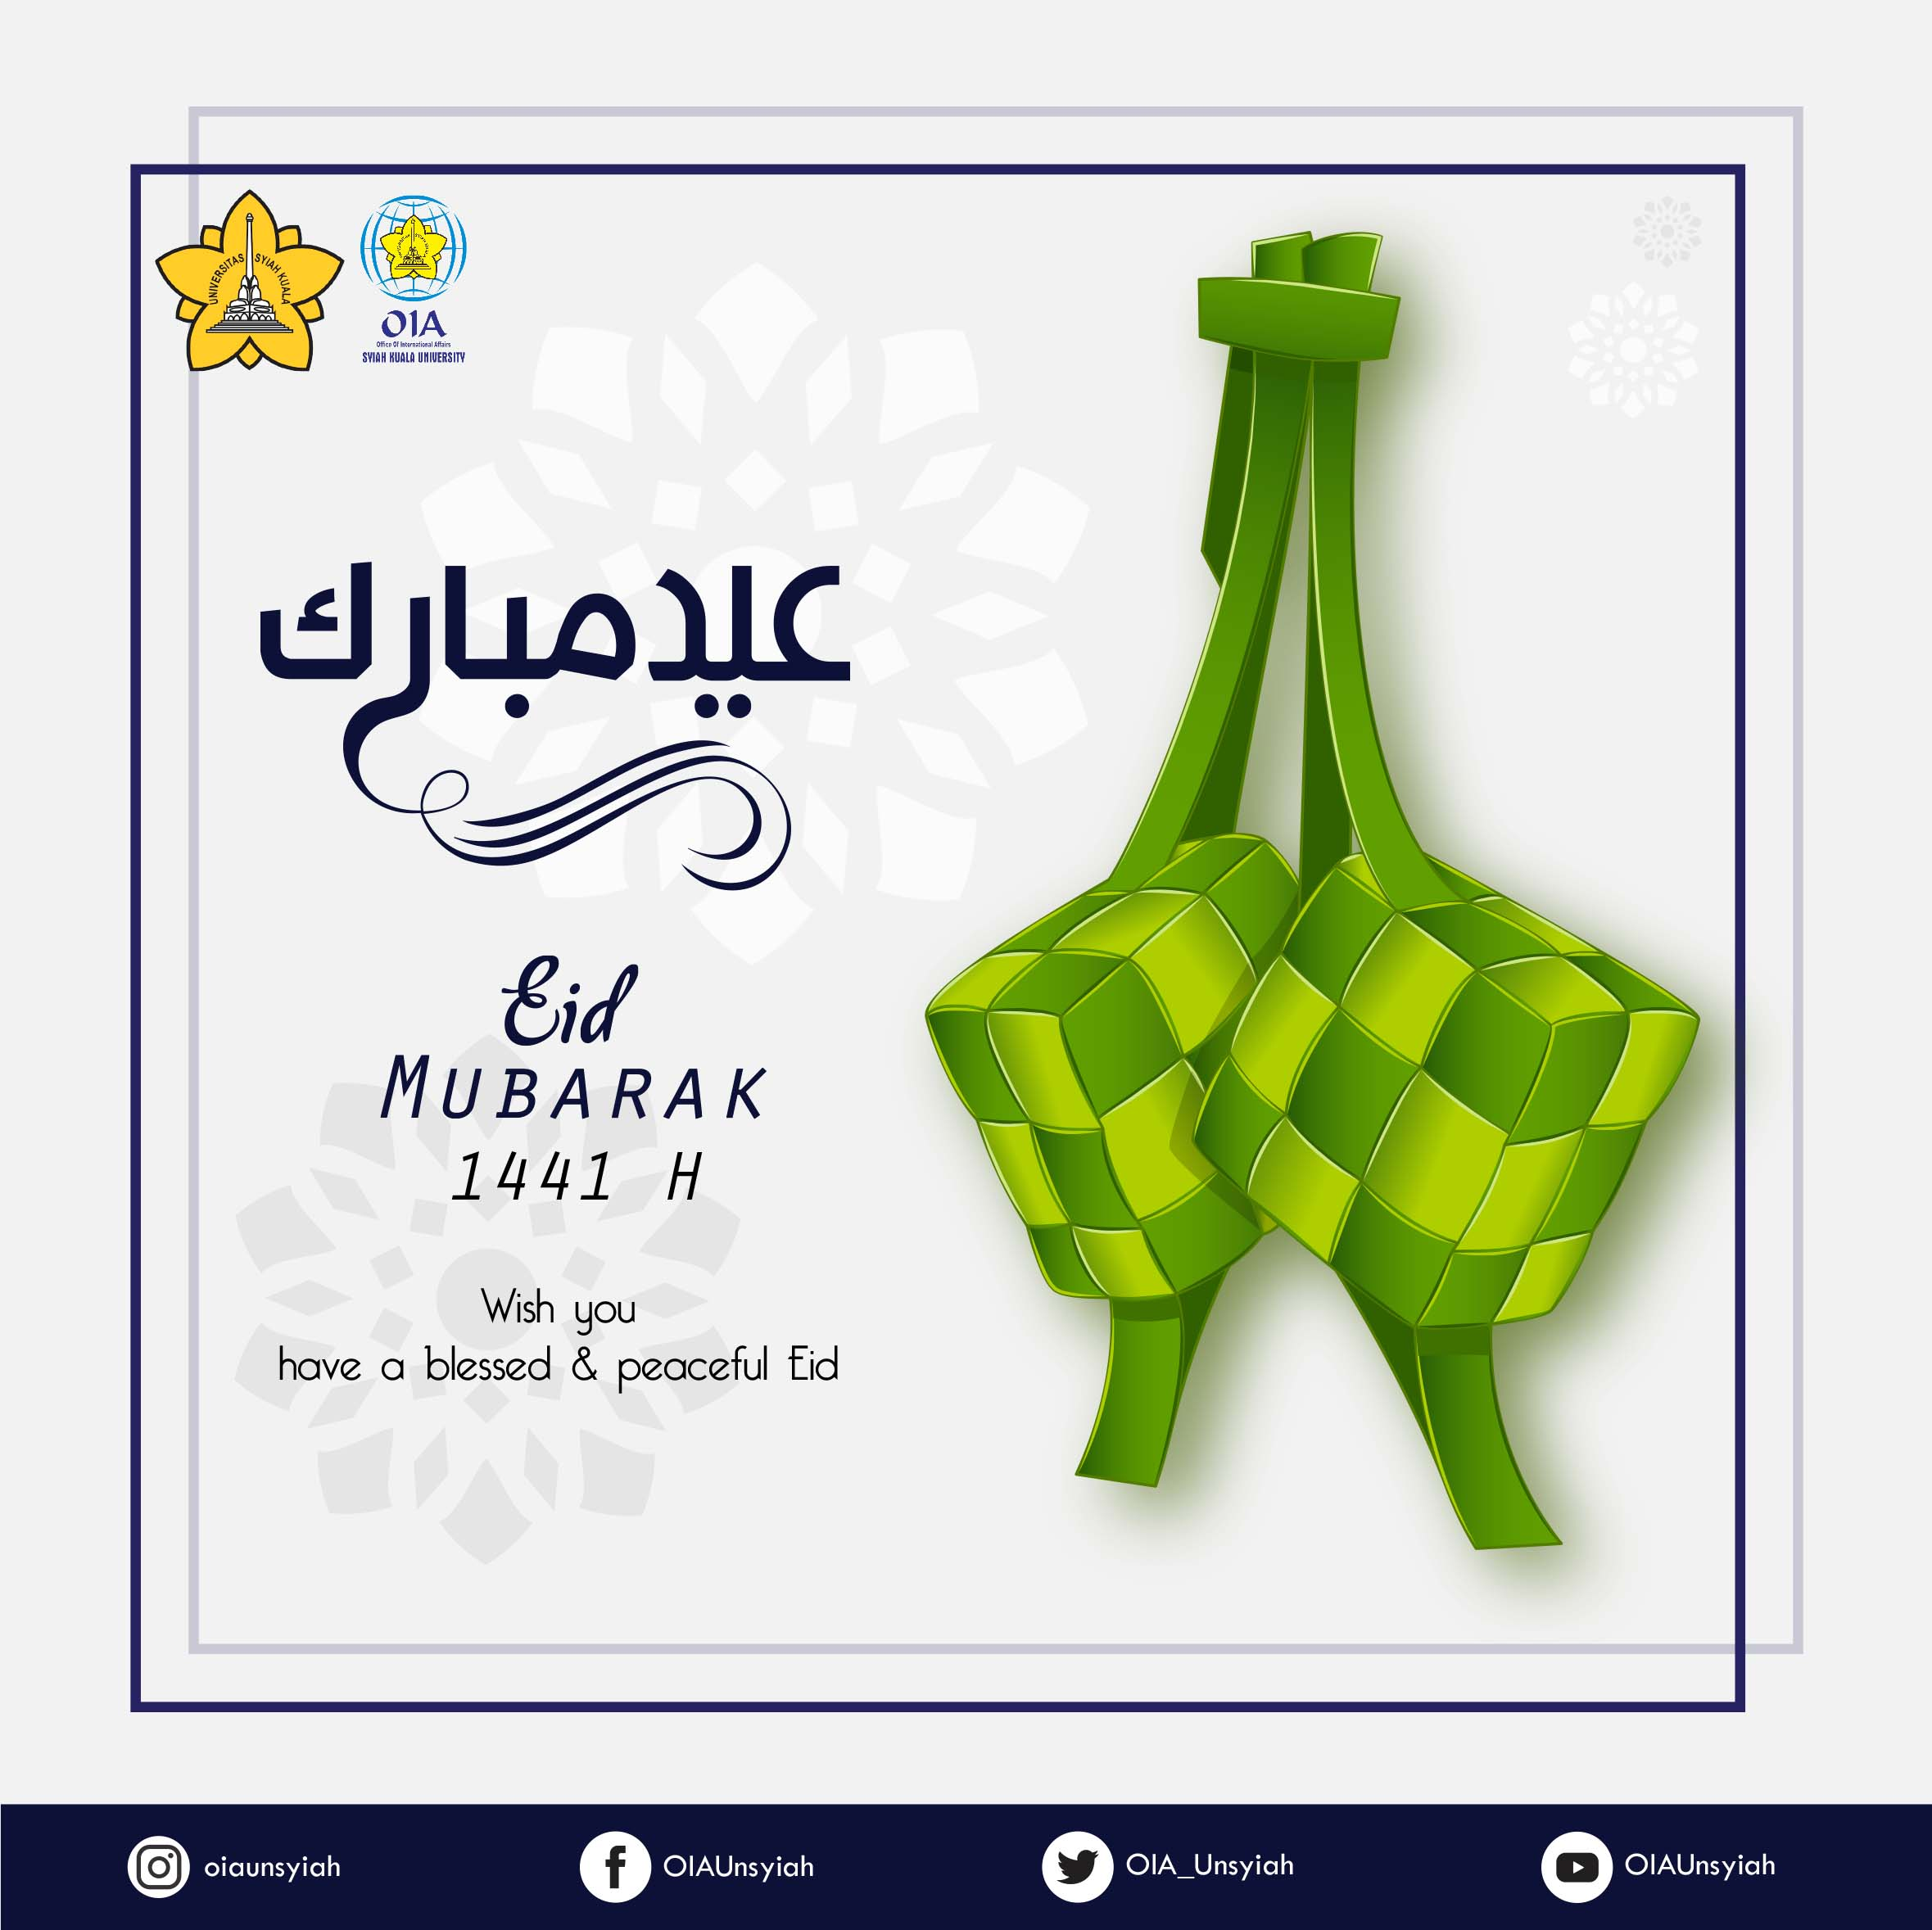 Happy Eid al Fitr 1441H to all celebrating Eid